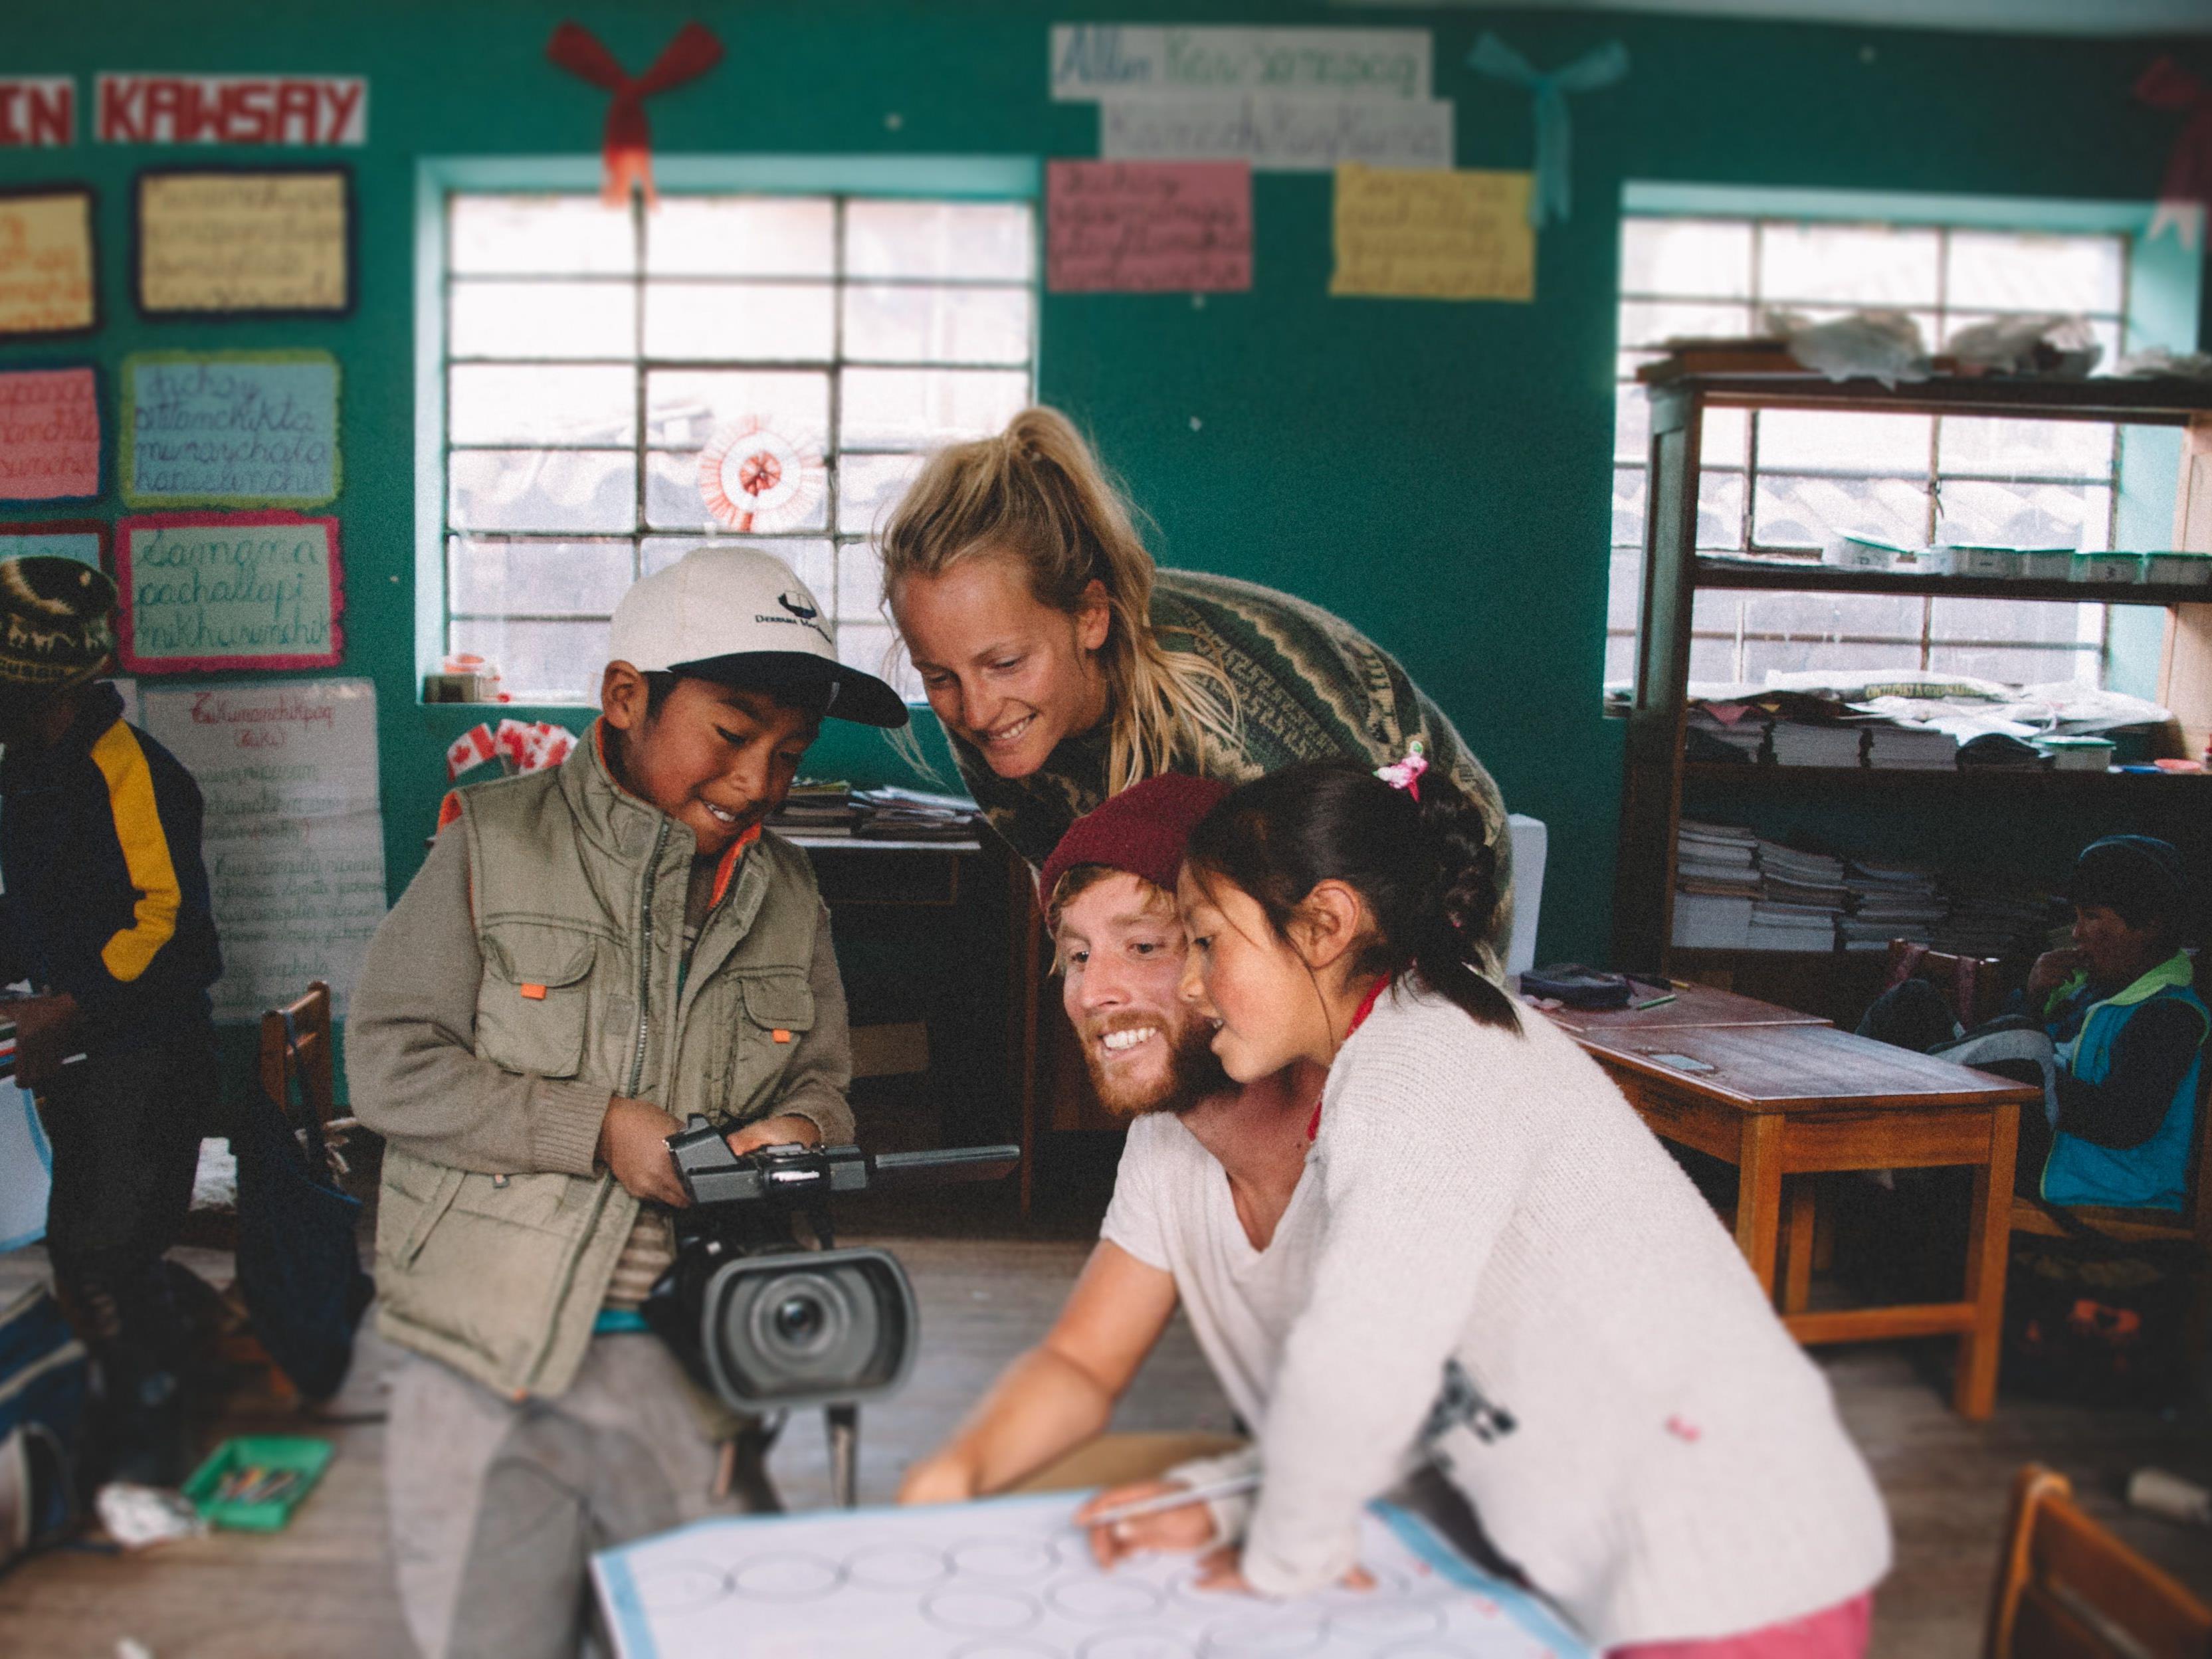 Partnersuche globetrotter